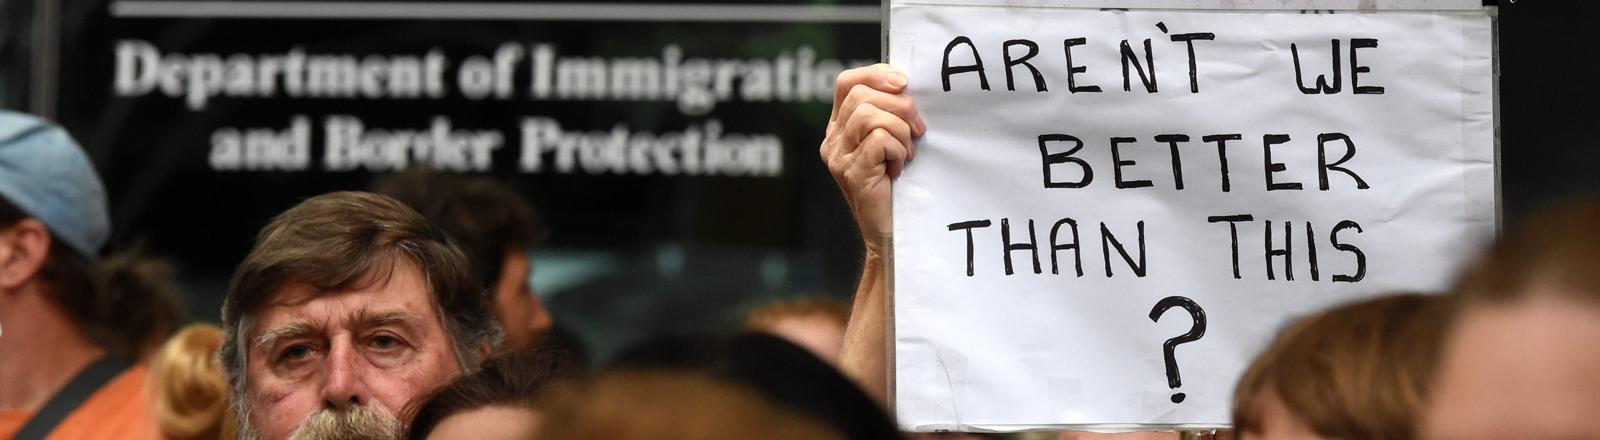 Proteste gegen die Asylpolitik Australiens in Brisbane am 5. Februar